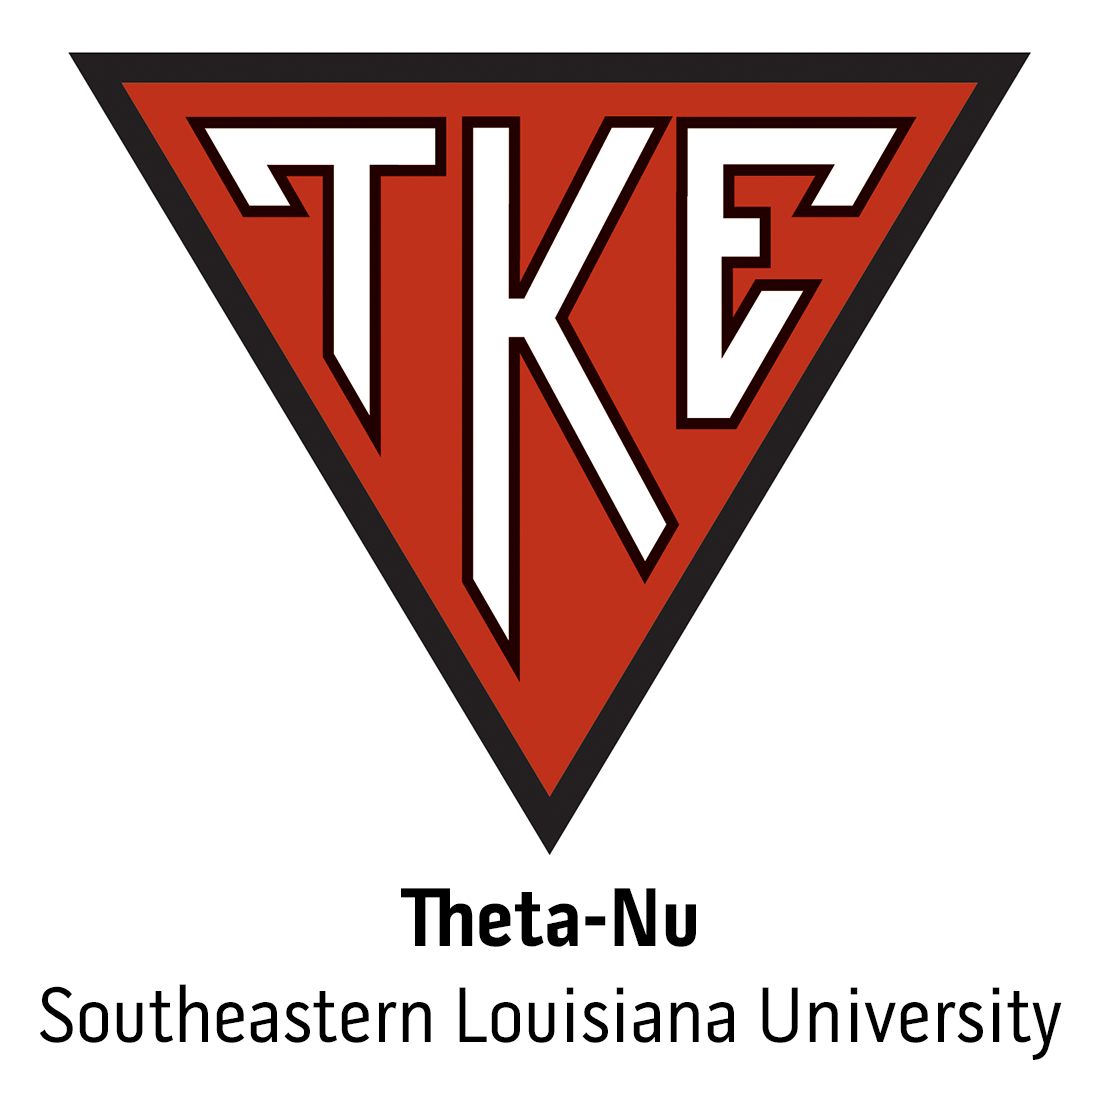 Theta-Nu Chapter at Southeastern Louisiana University